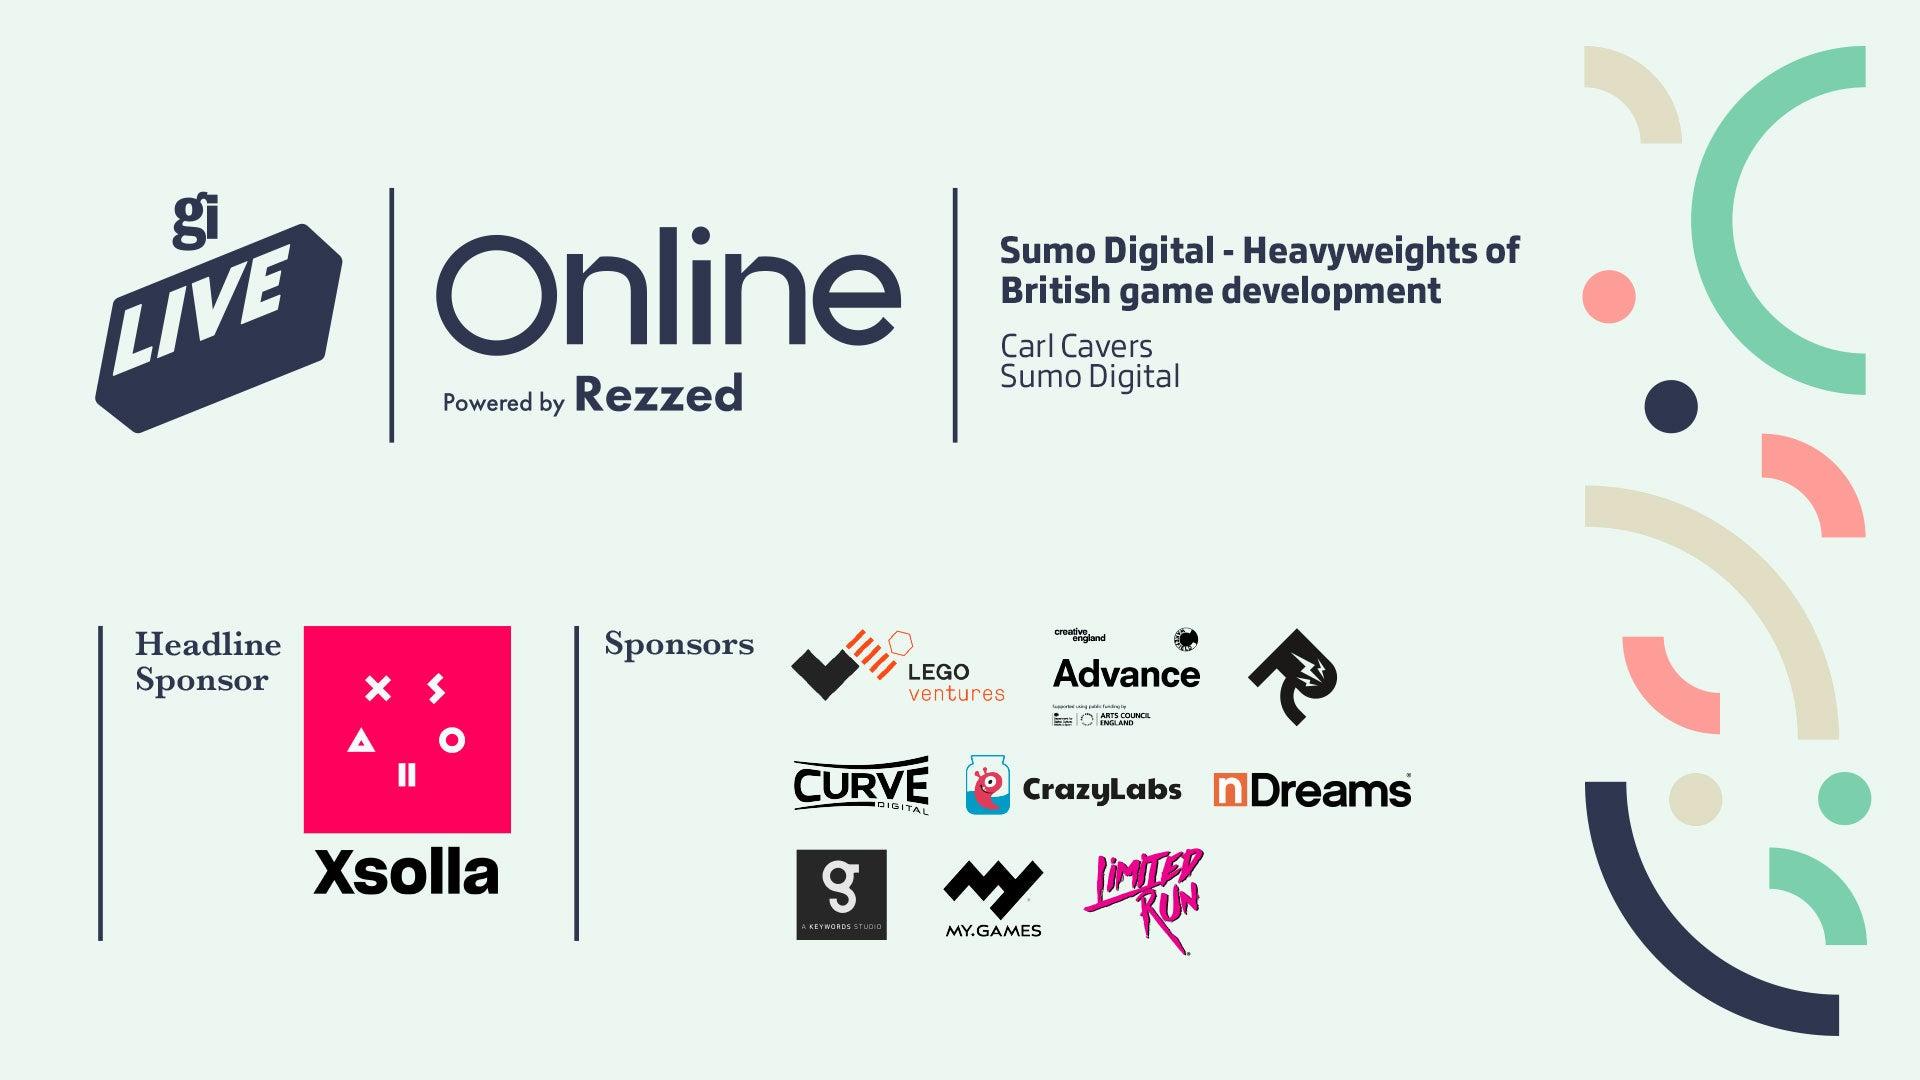 Image for Sumo Digital - heavyweights of British game development